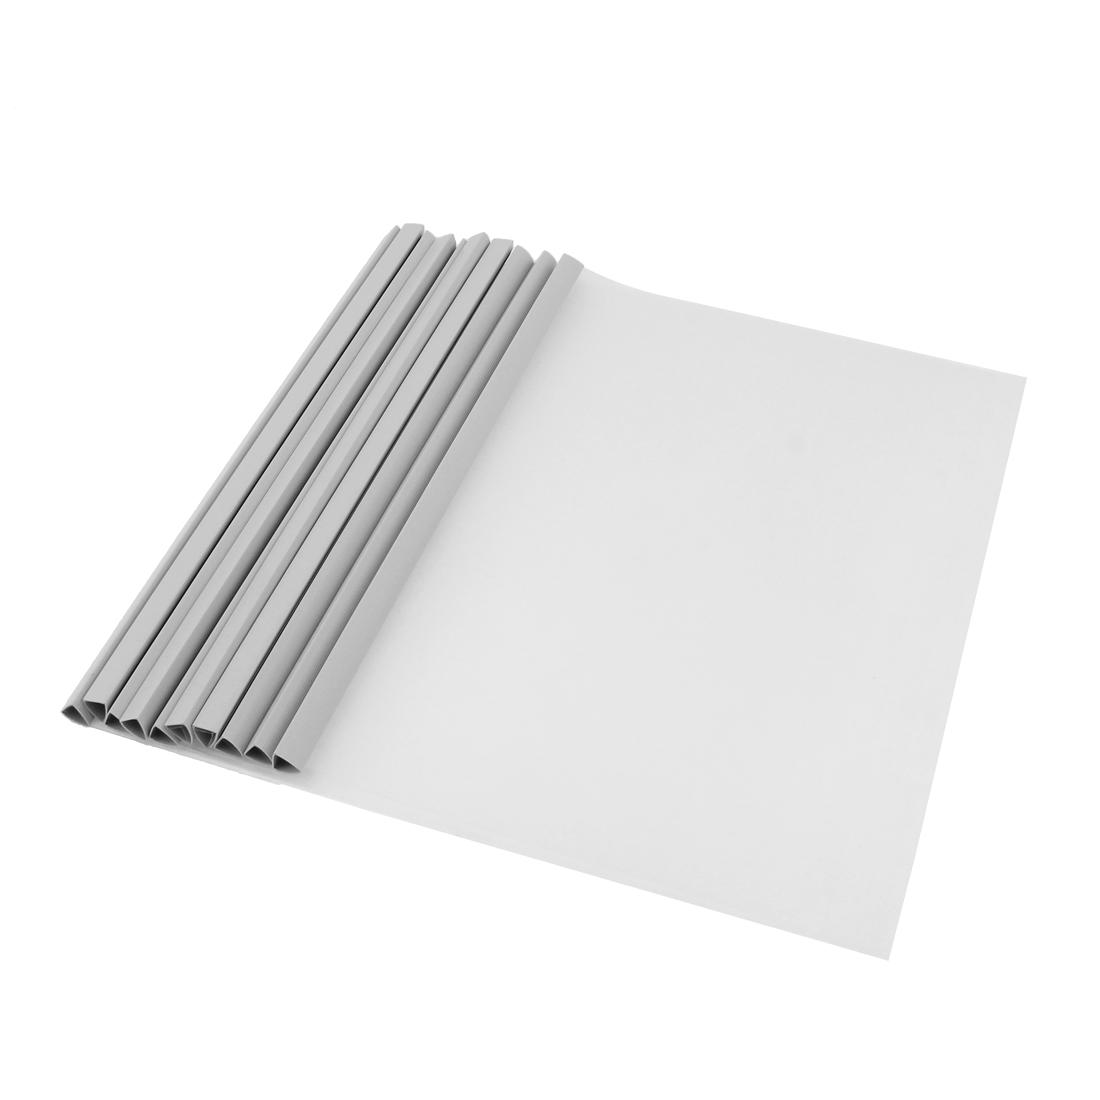 Office Supplies Sliding Bar Design Open Top Side A4 Size Clear PVC Cut Flush Filing File Folders 10pcs